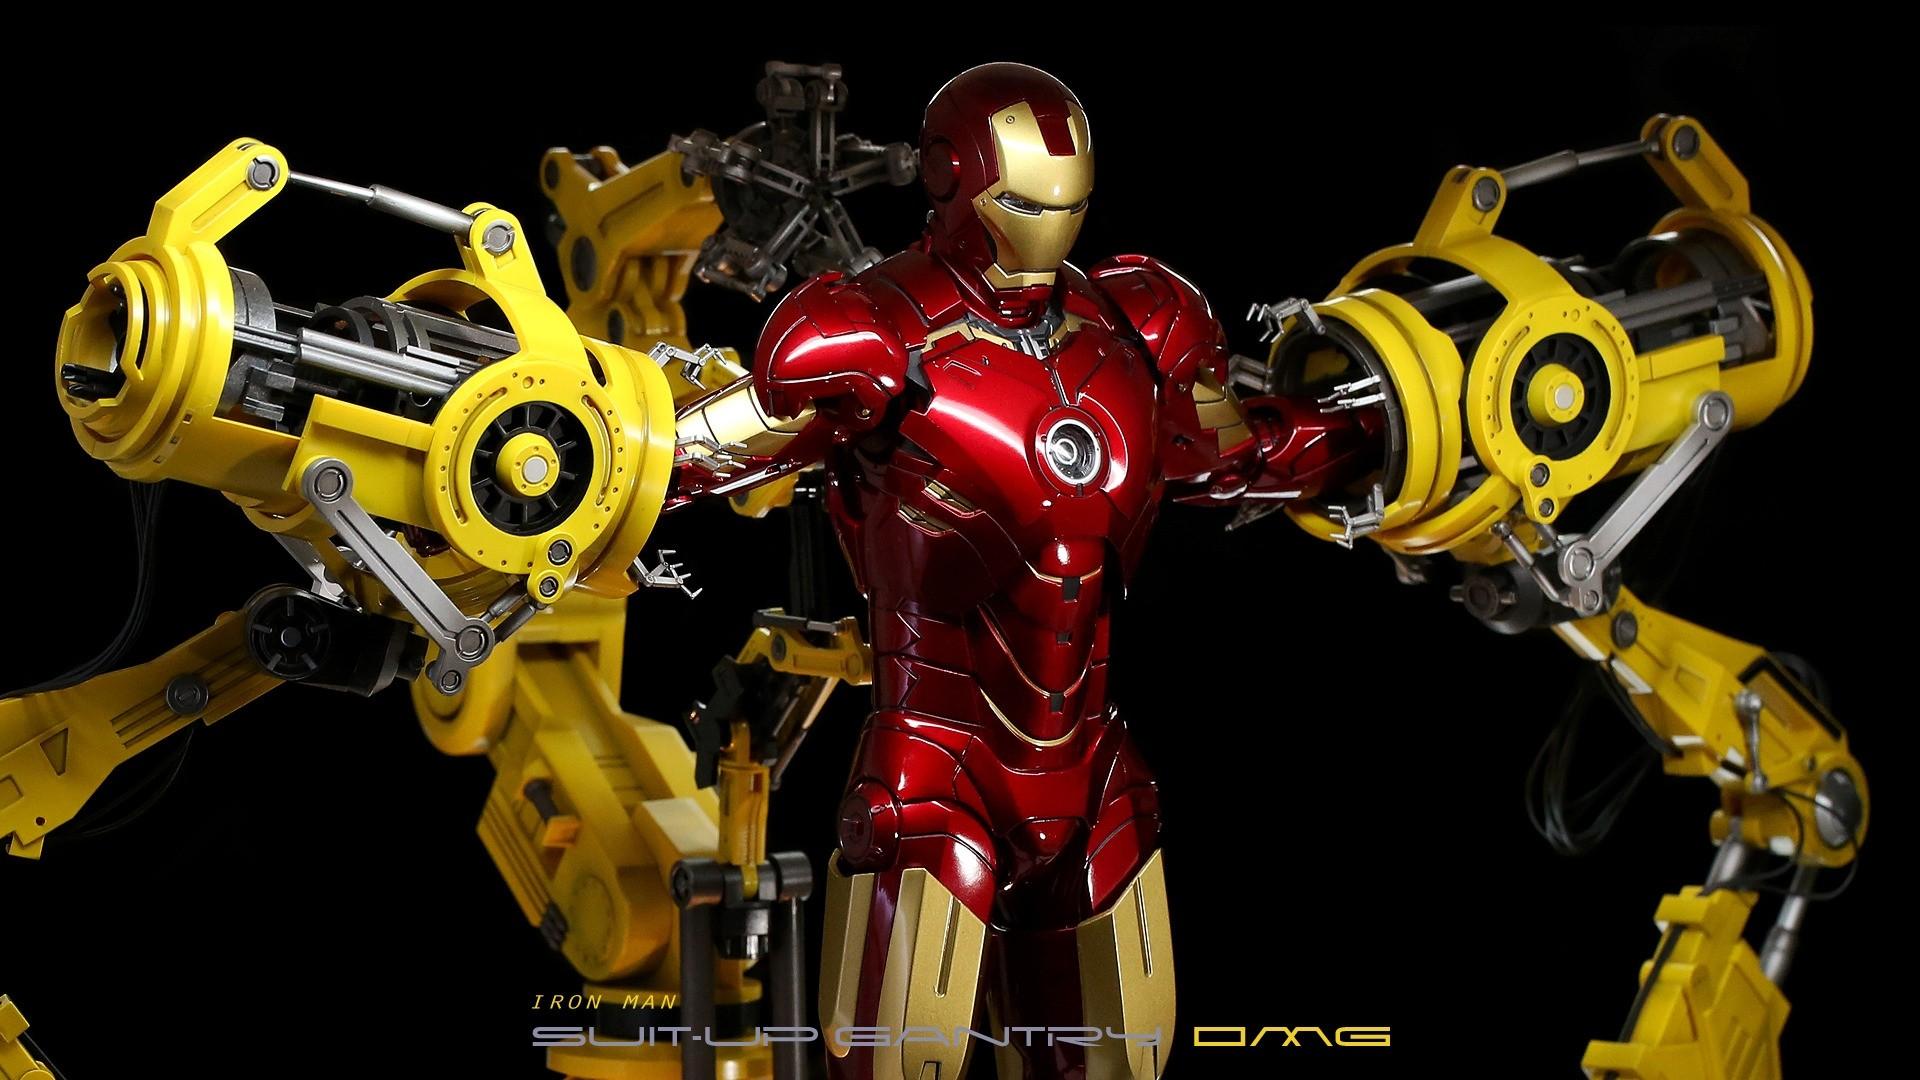 Wallpaper 1920x1080 Px Iron Man 1920x1080 Goodfon